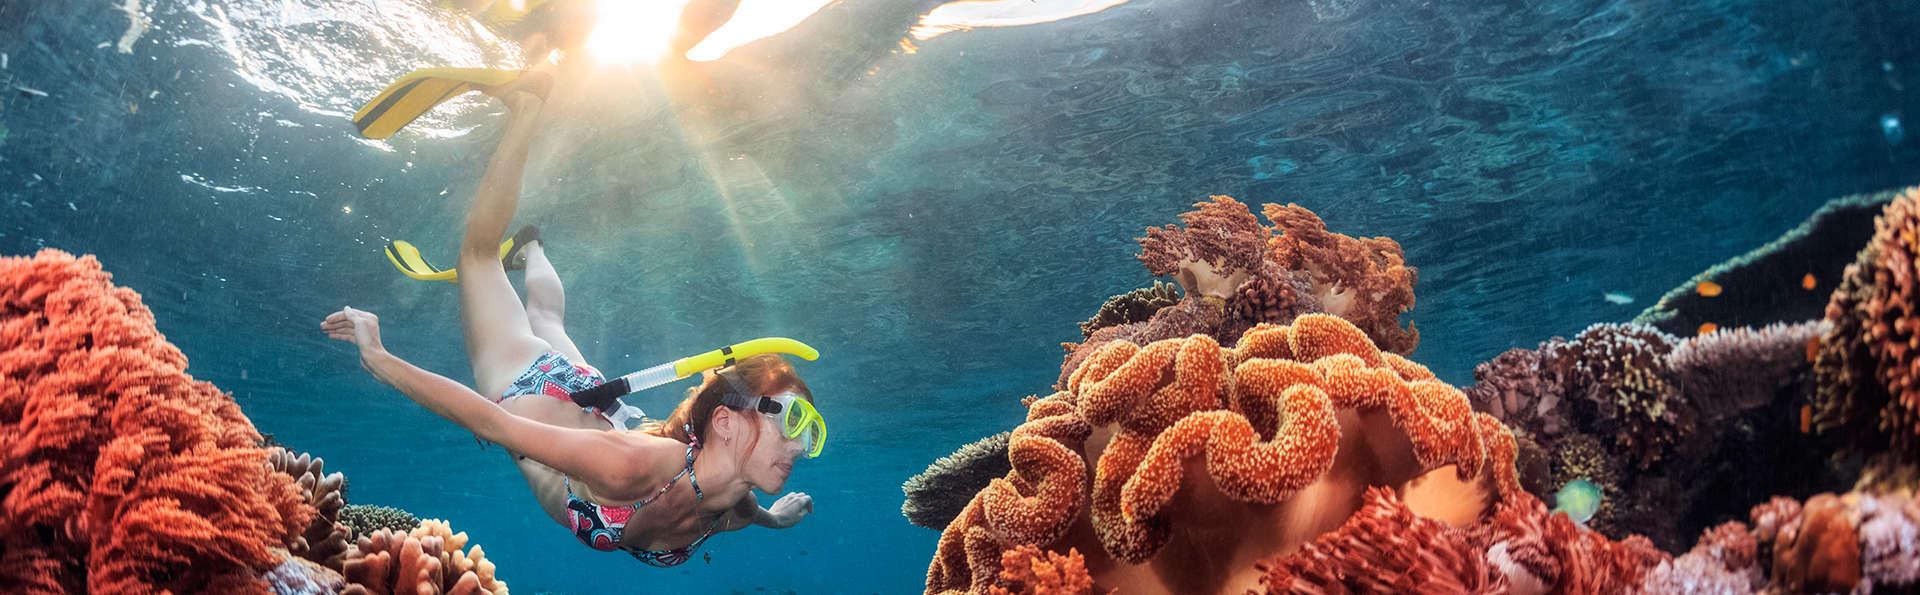 Hotel & Diving Les Illes - EDIT_snorkel.jpg